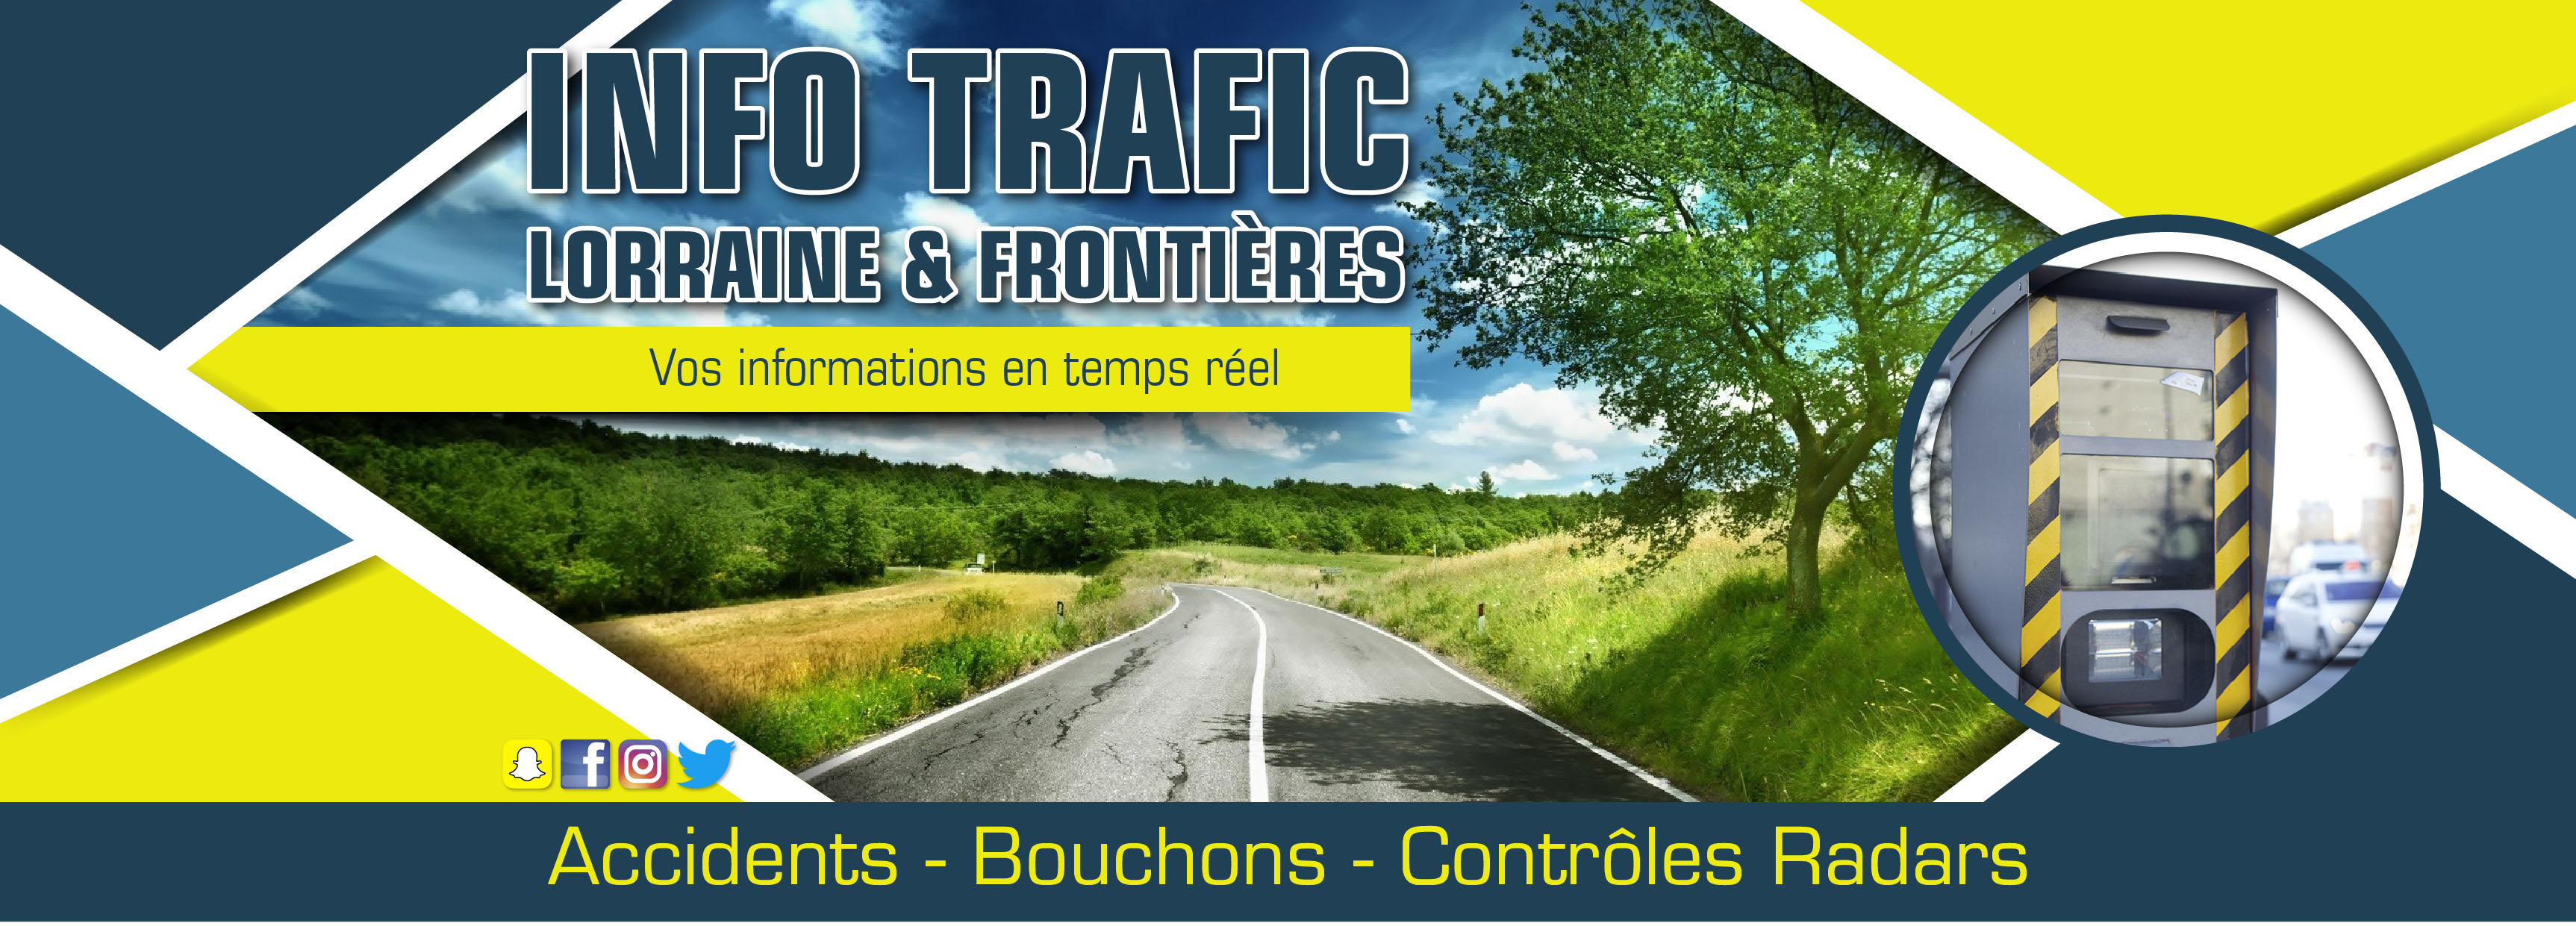 ITLF – Info Trafic Lorraine & Frontières